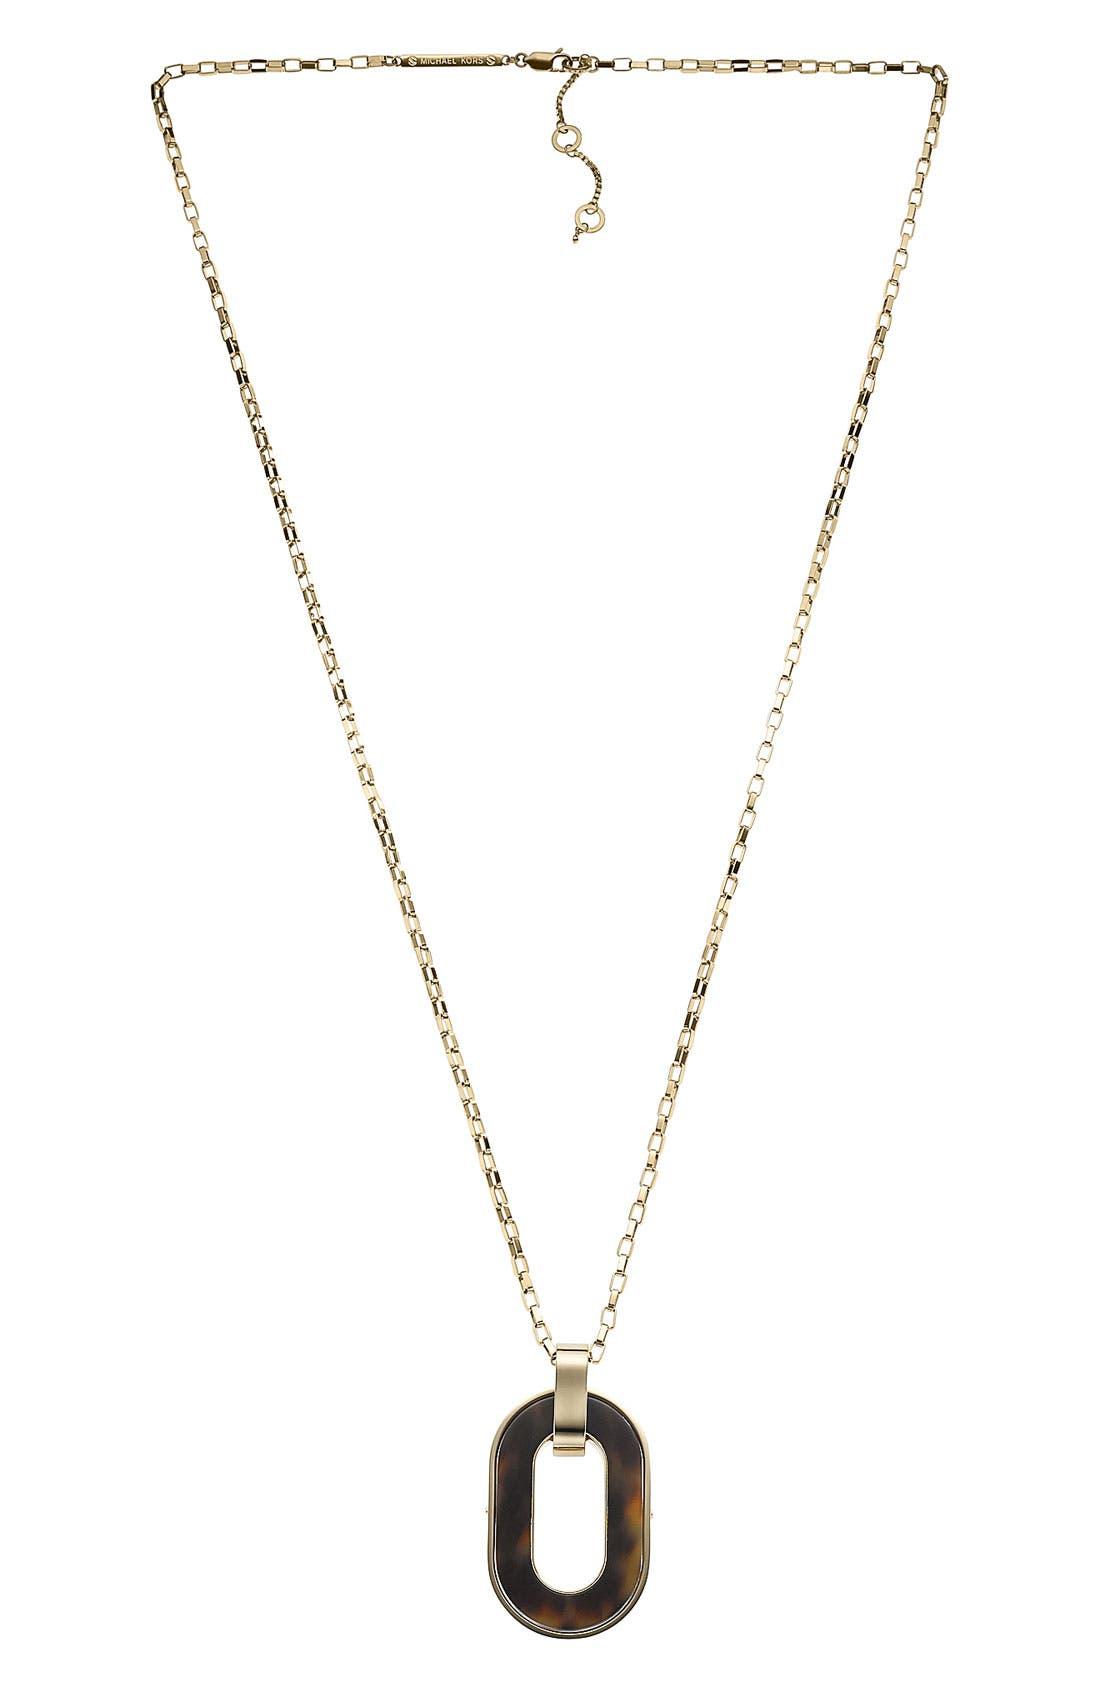 Alternate Image 1 Selected - Michael Kors 'Jet Set' Long Pendant Necklace